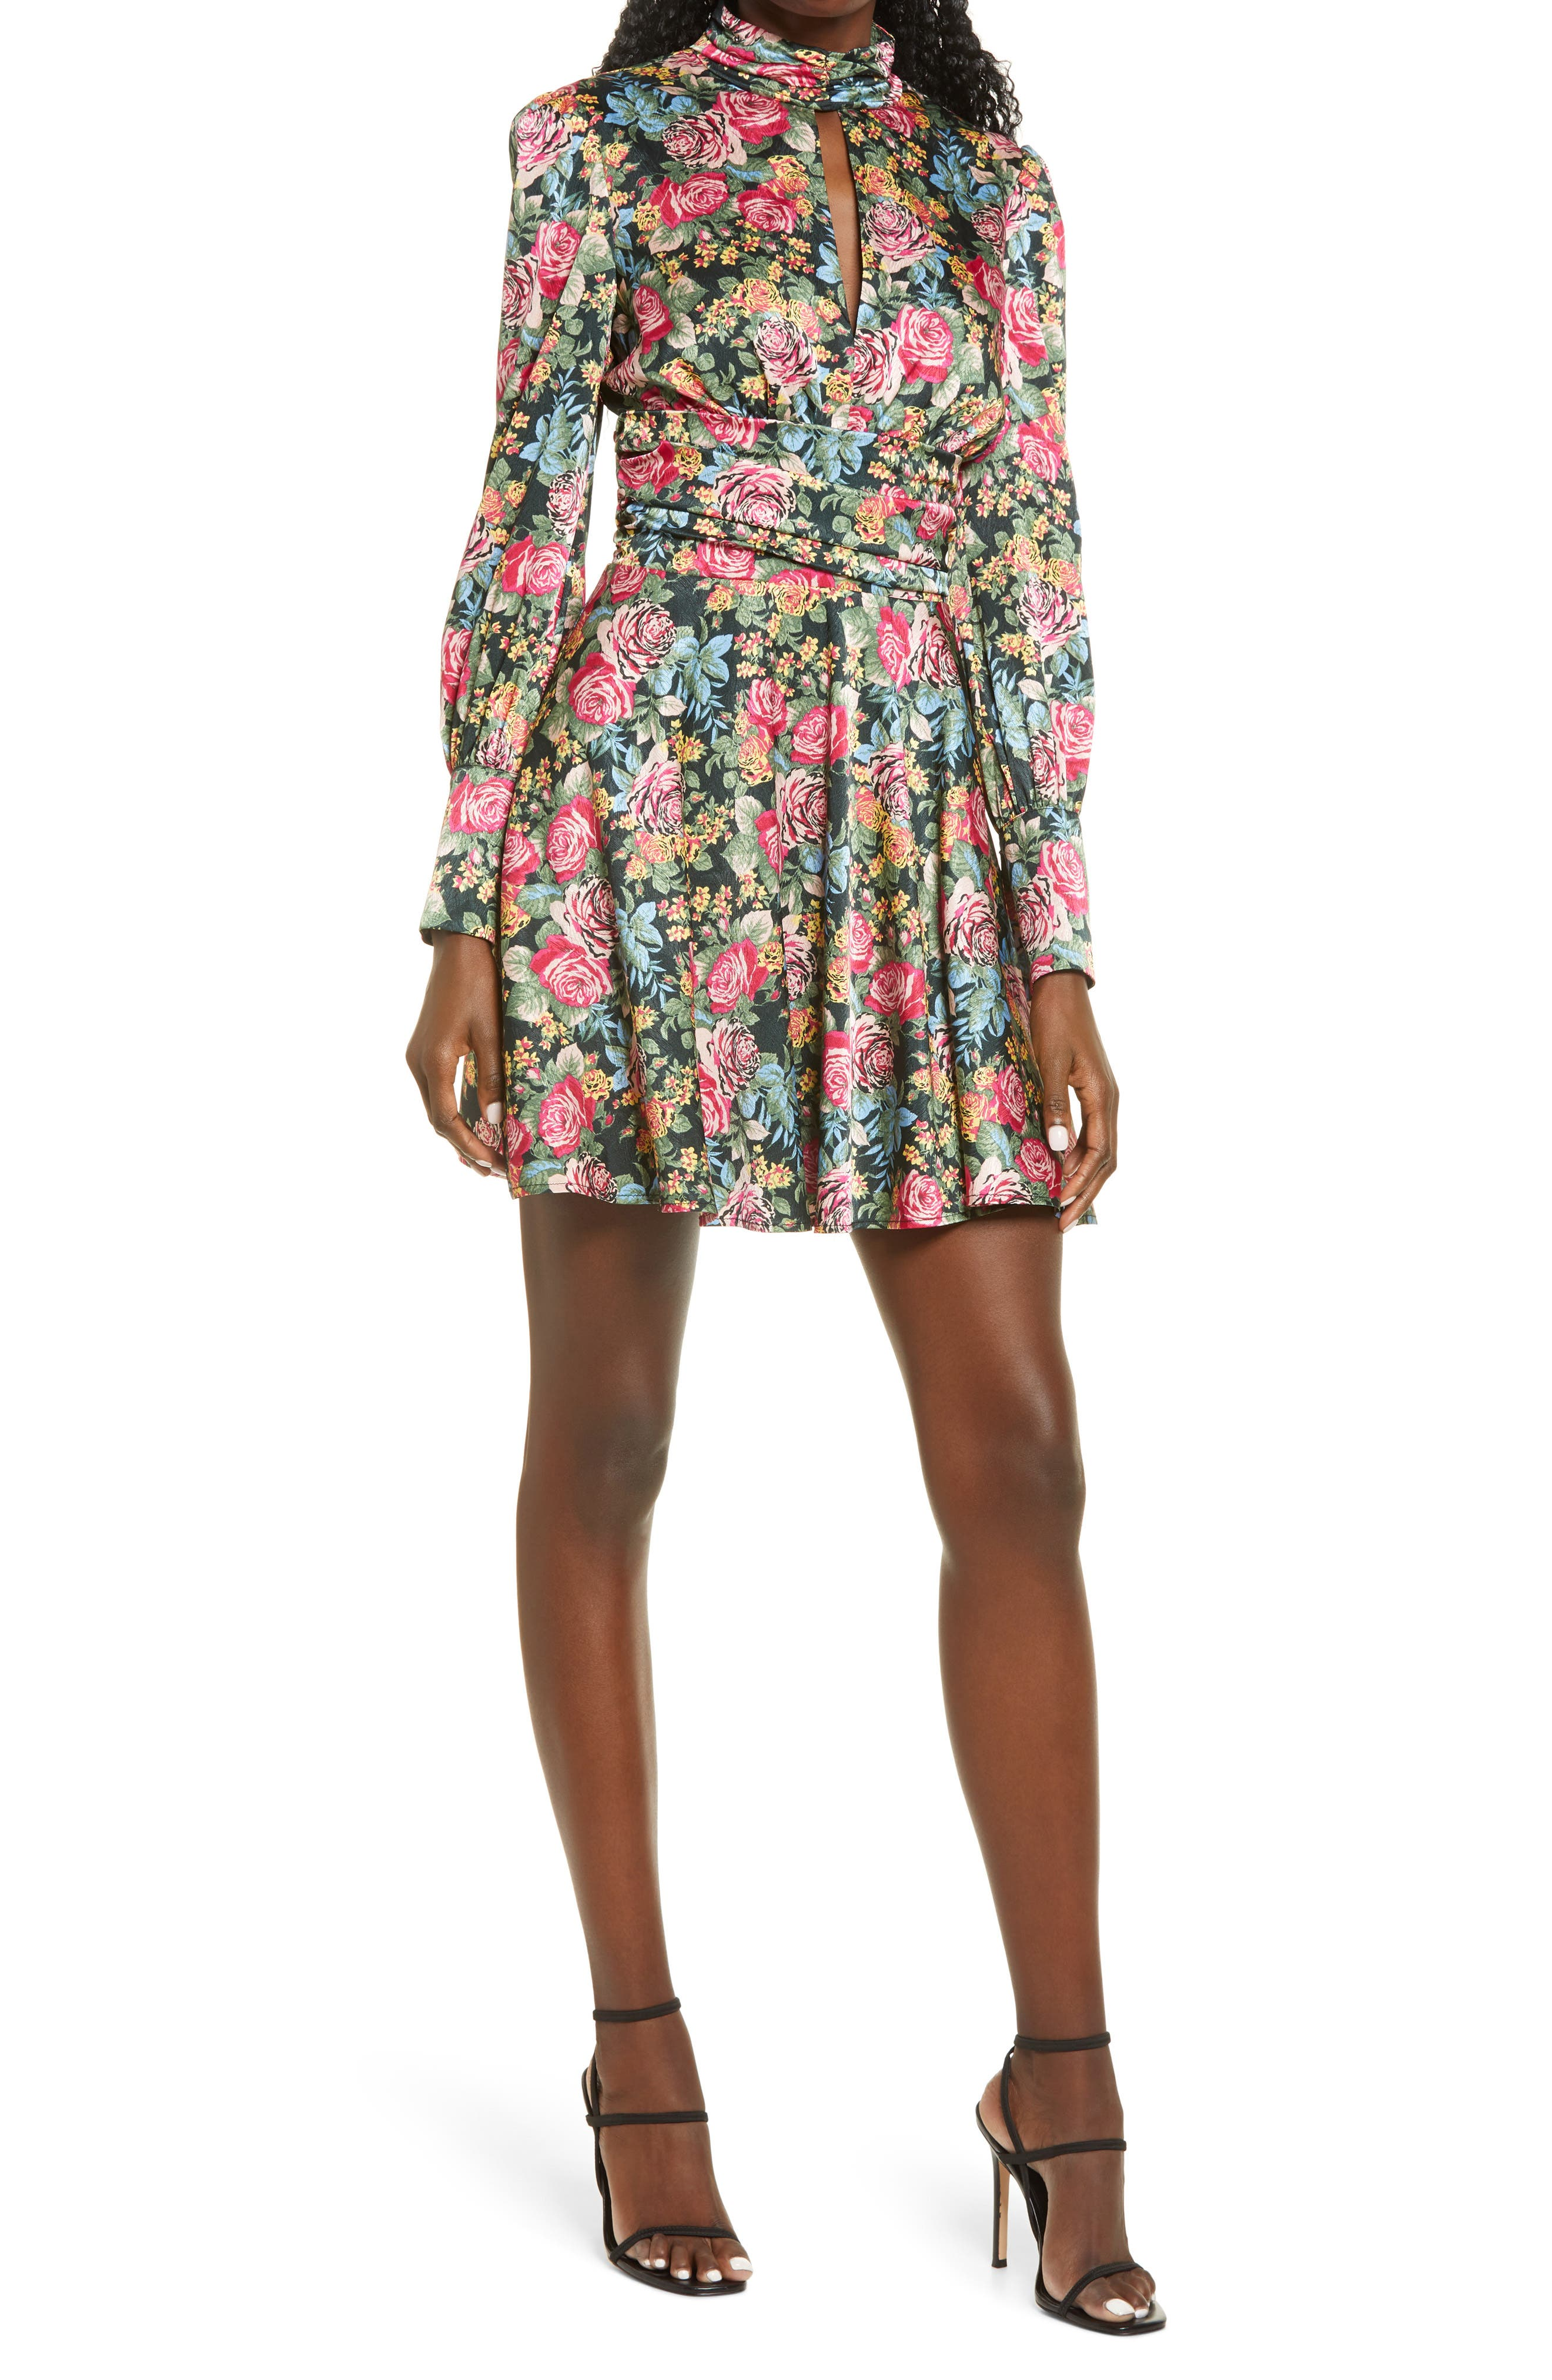 Image of WAYF Holly Long Sleeve Minidress